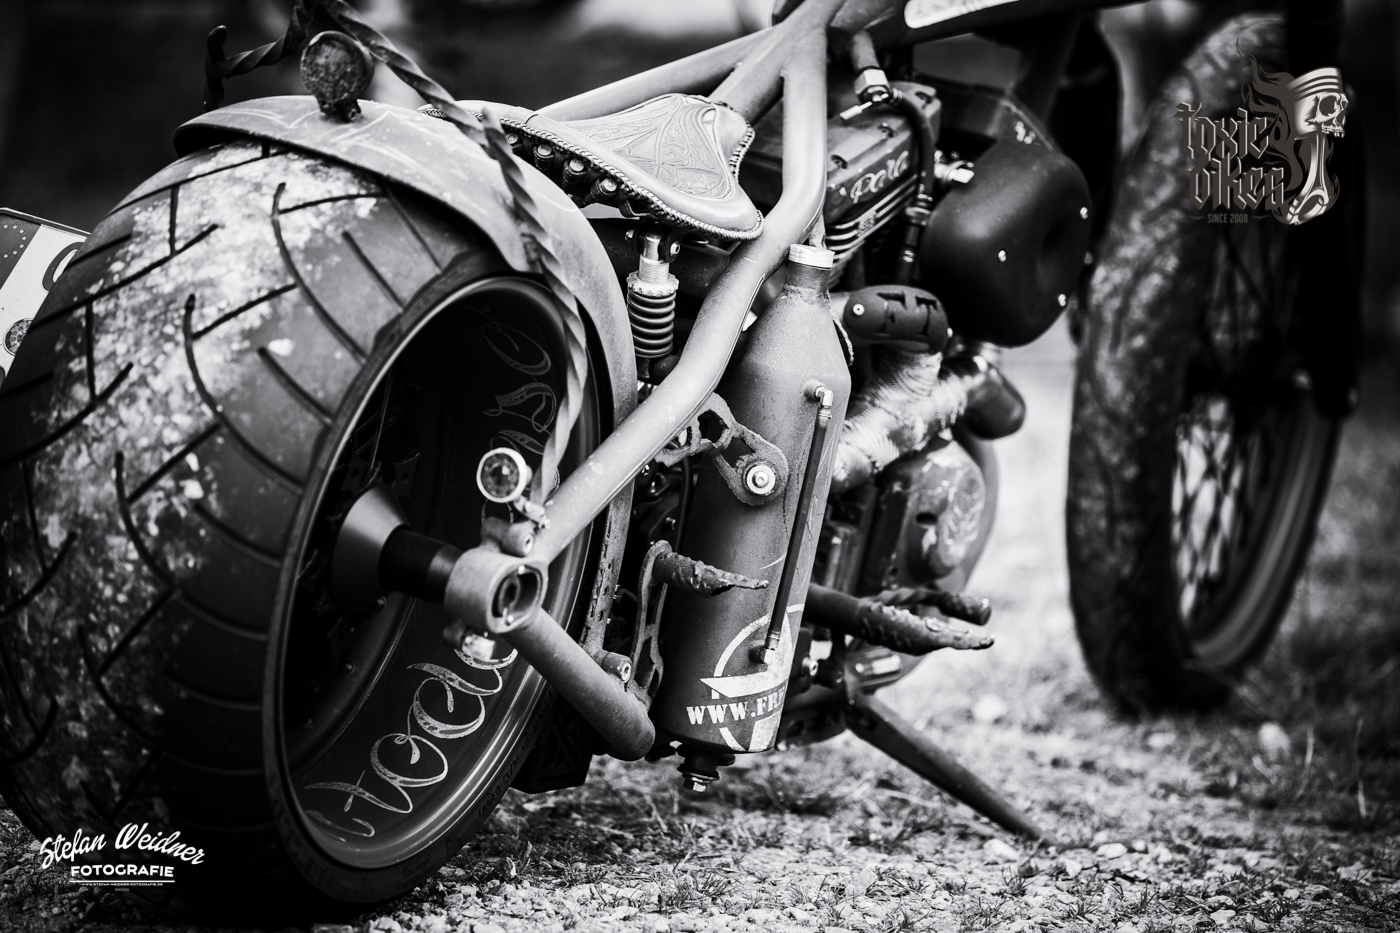 c-Stefan-Weidner-Fotografie_Toxic-Bikes-Hohenfelde_15-08-2015_IMG_3967-Bearbeitet.jpg